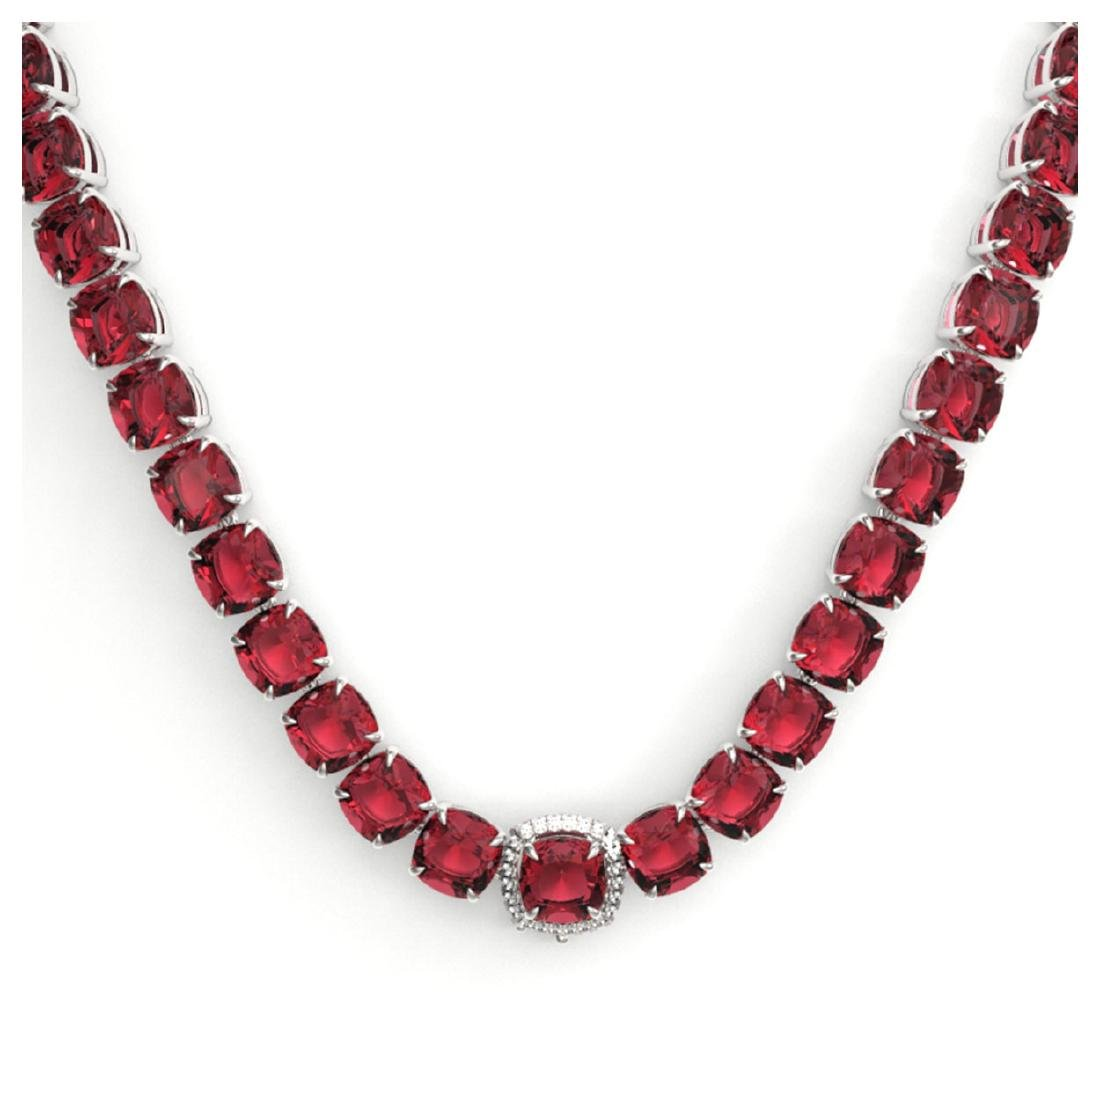 100 ctw Pink Tourmaline & VS/SI Diamond Necklace 14K - 2